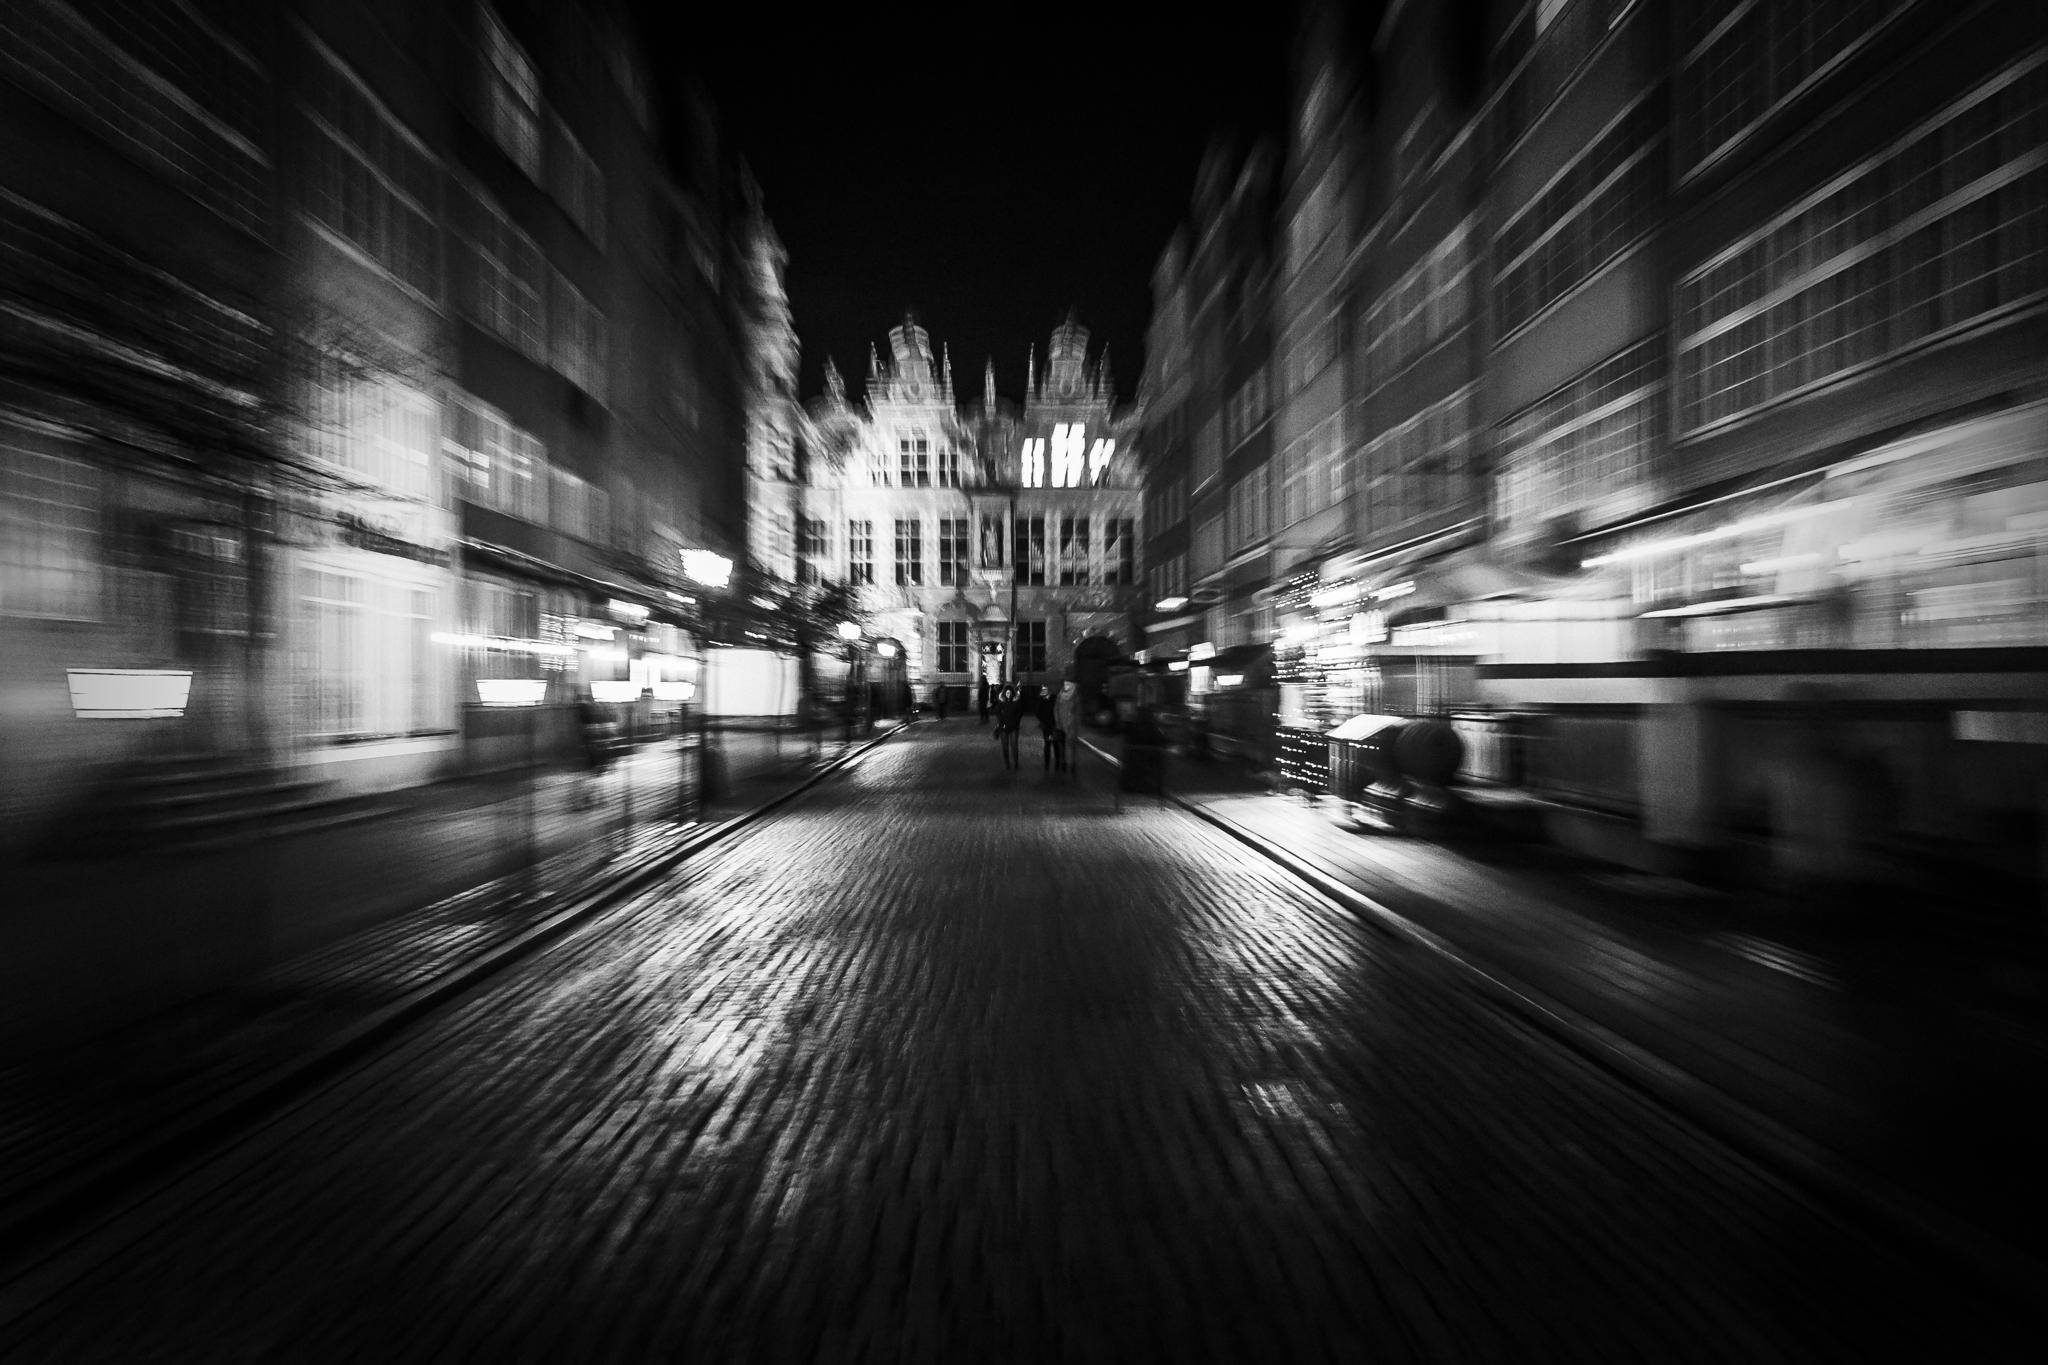 Streets of Gdansk